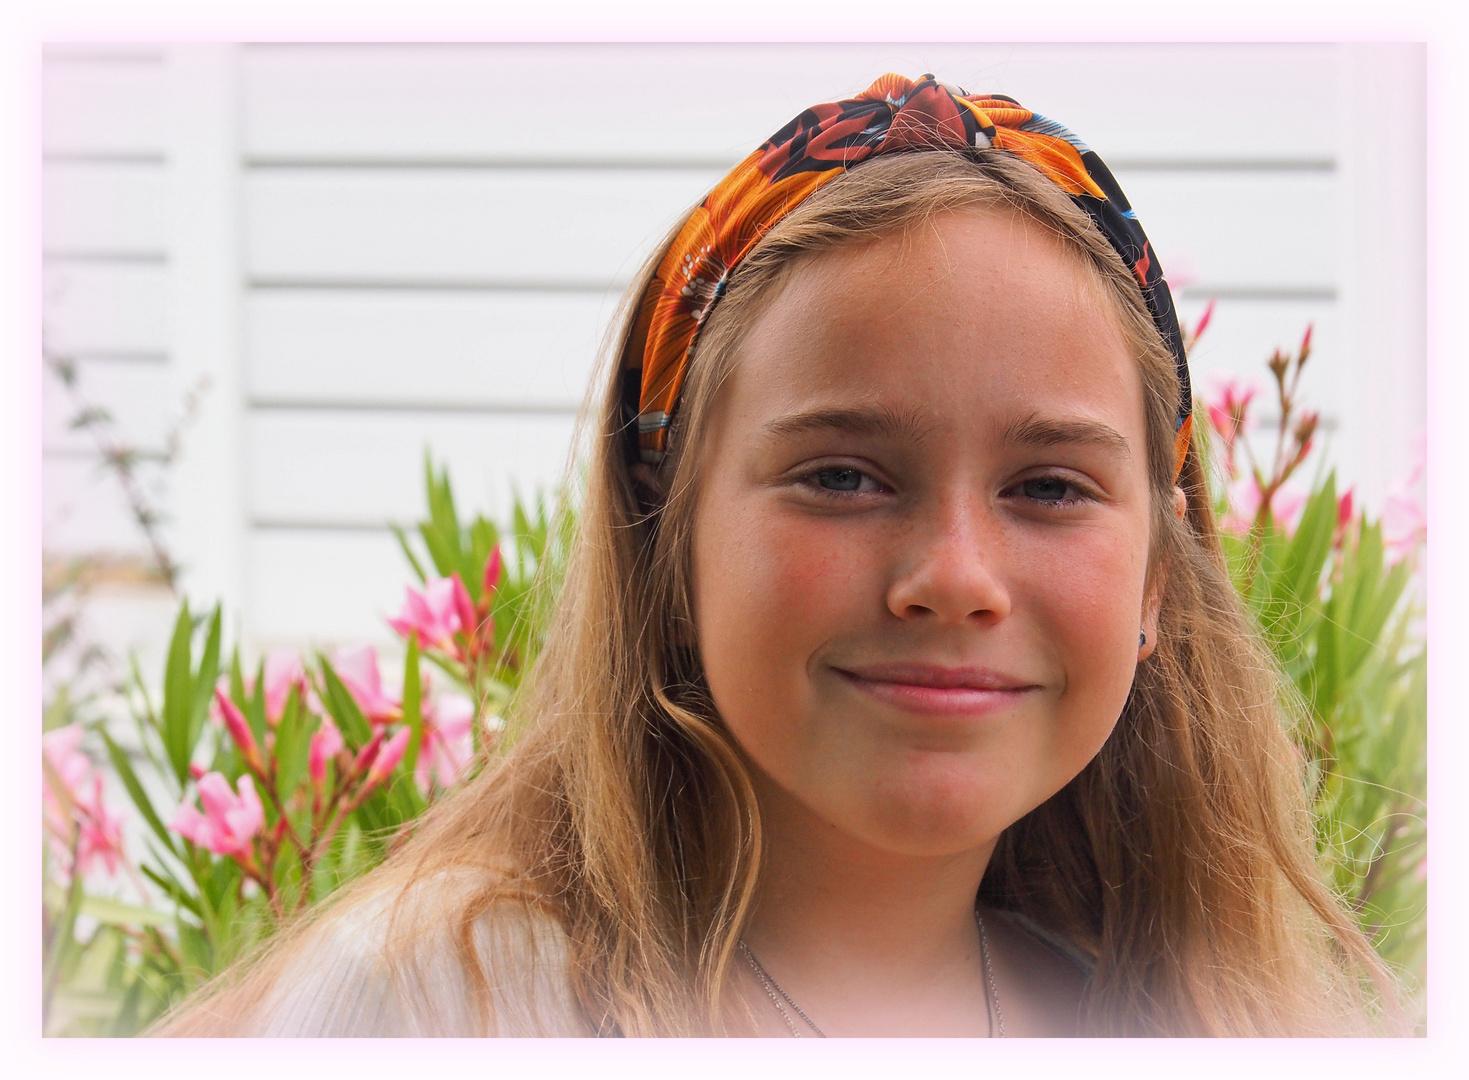 Le bandeau orange de Valentina